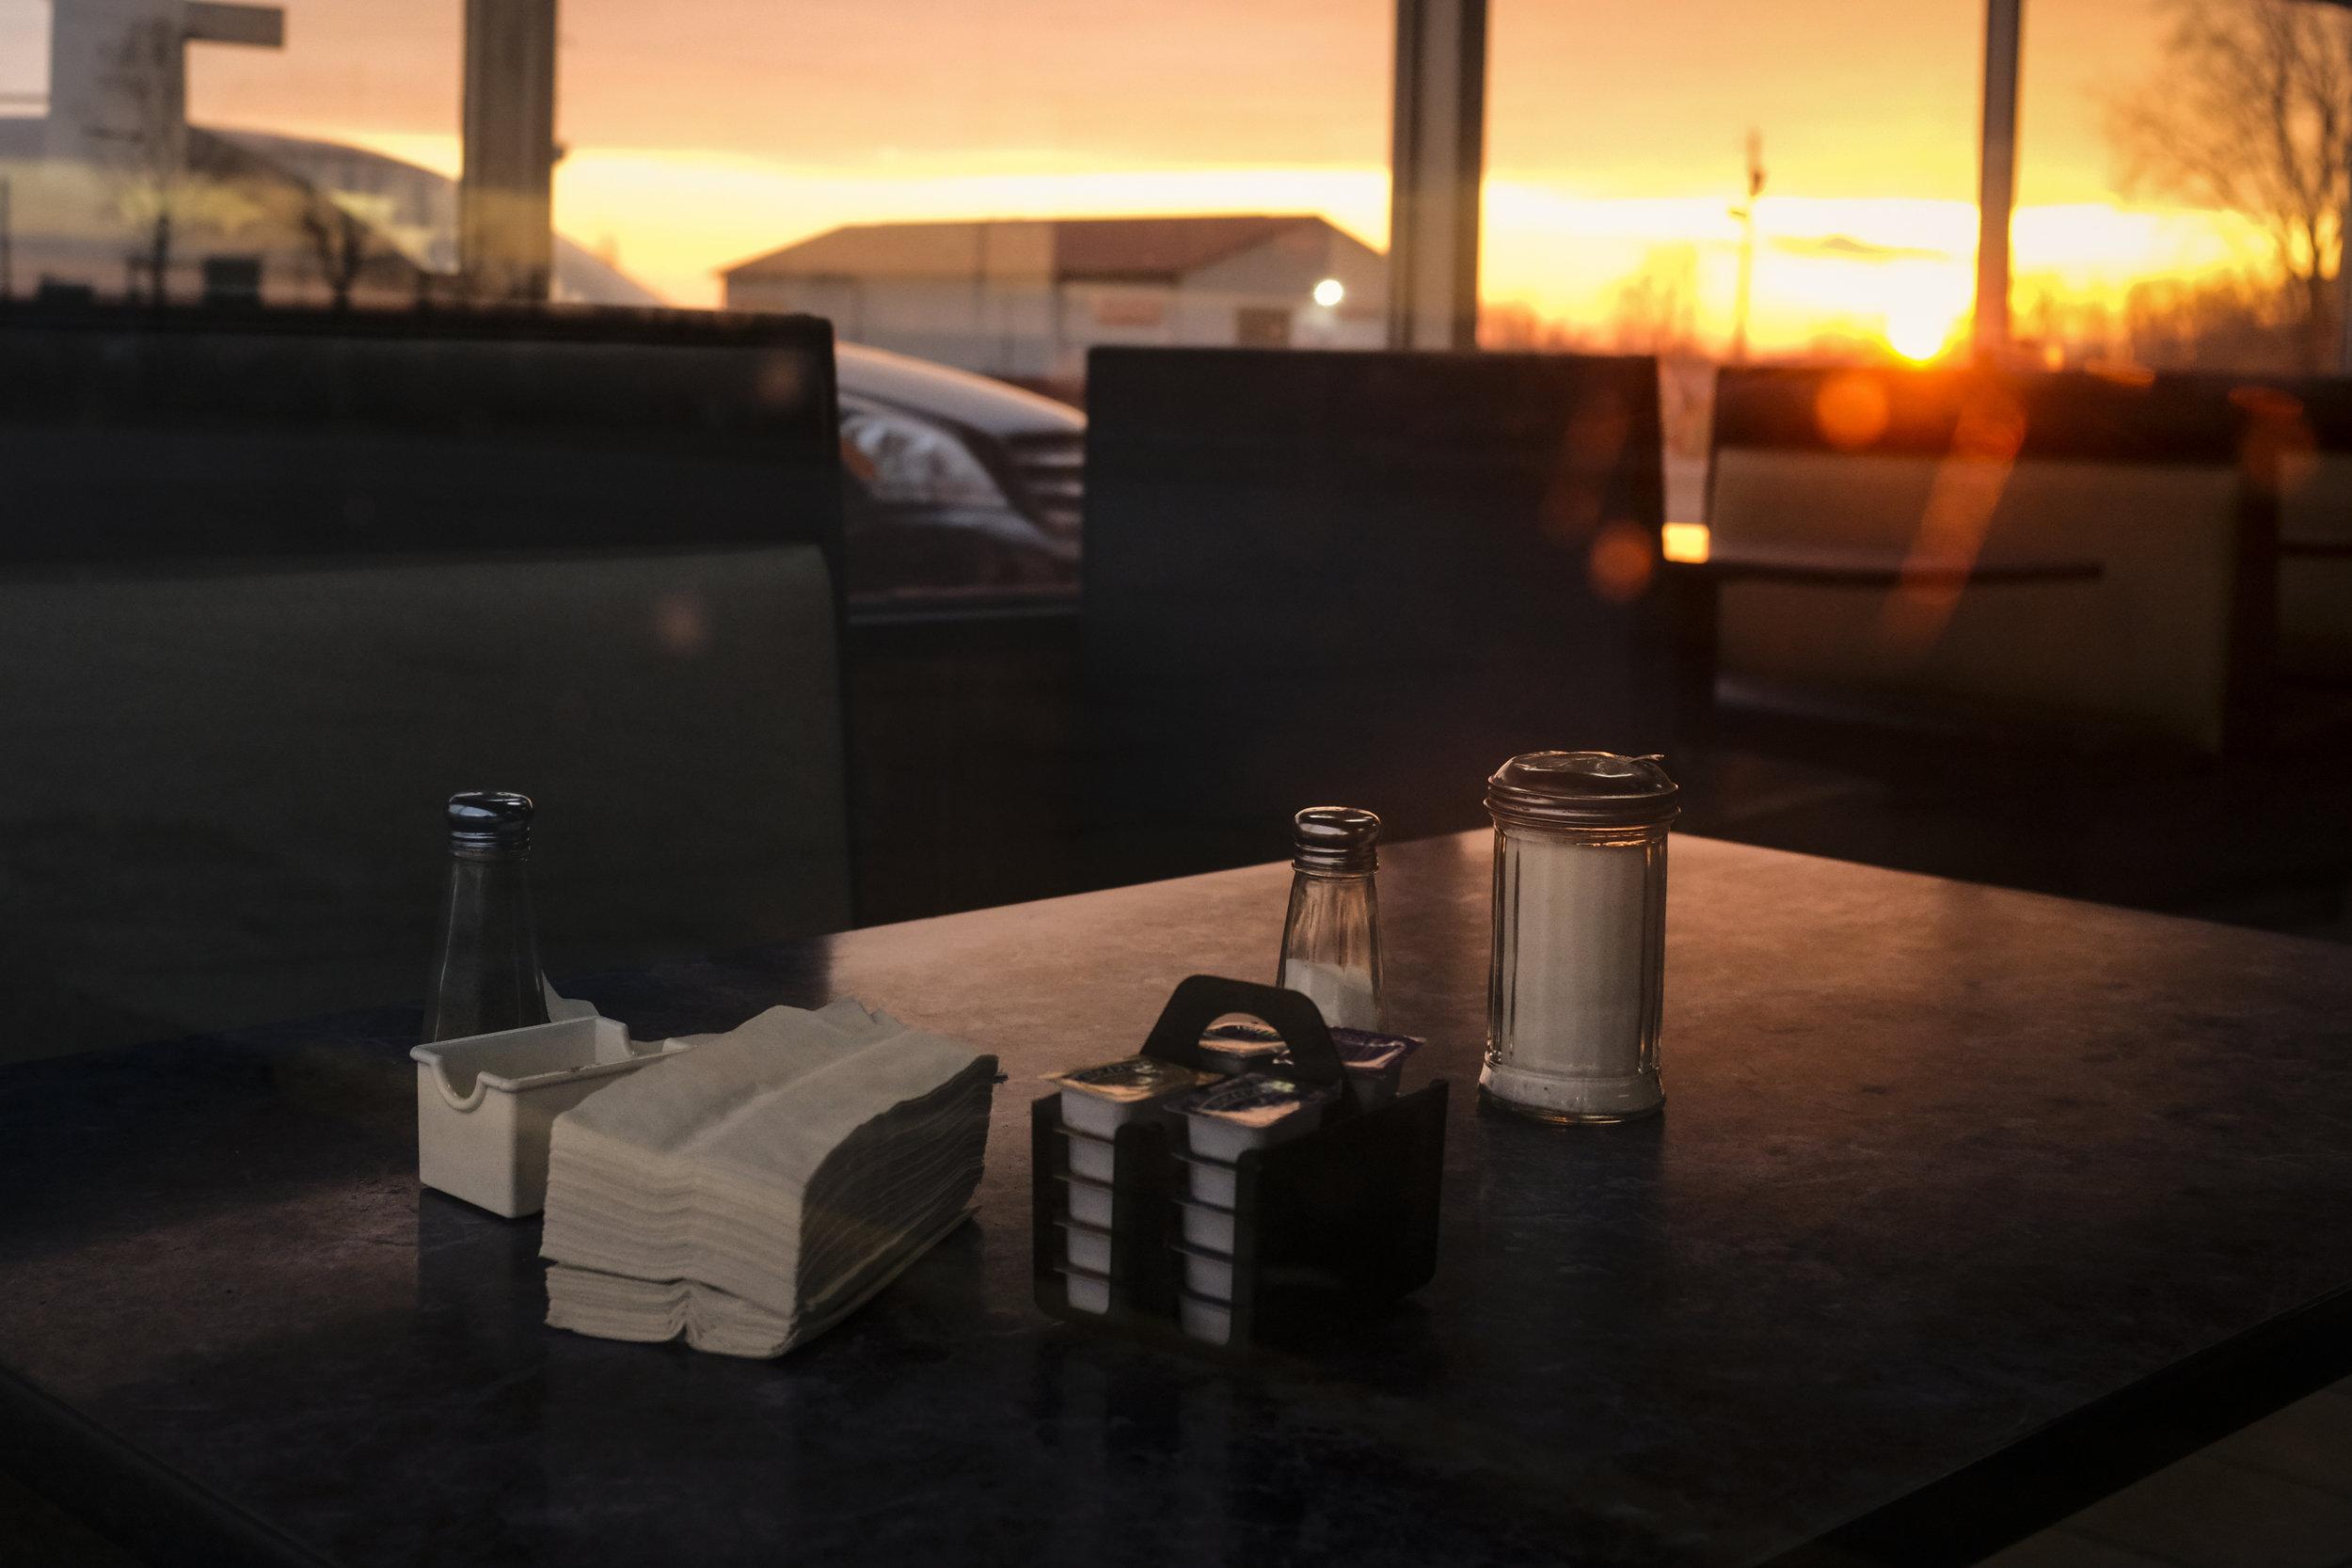 Sundown, Christmas evening in the diner.